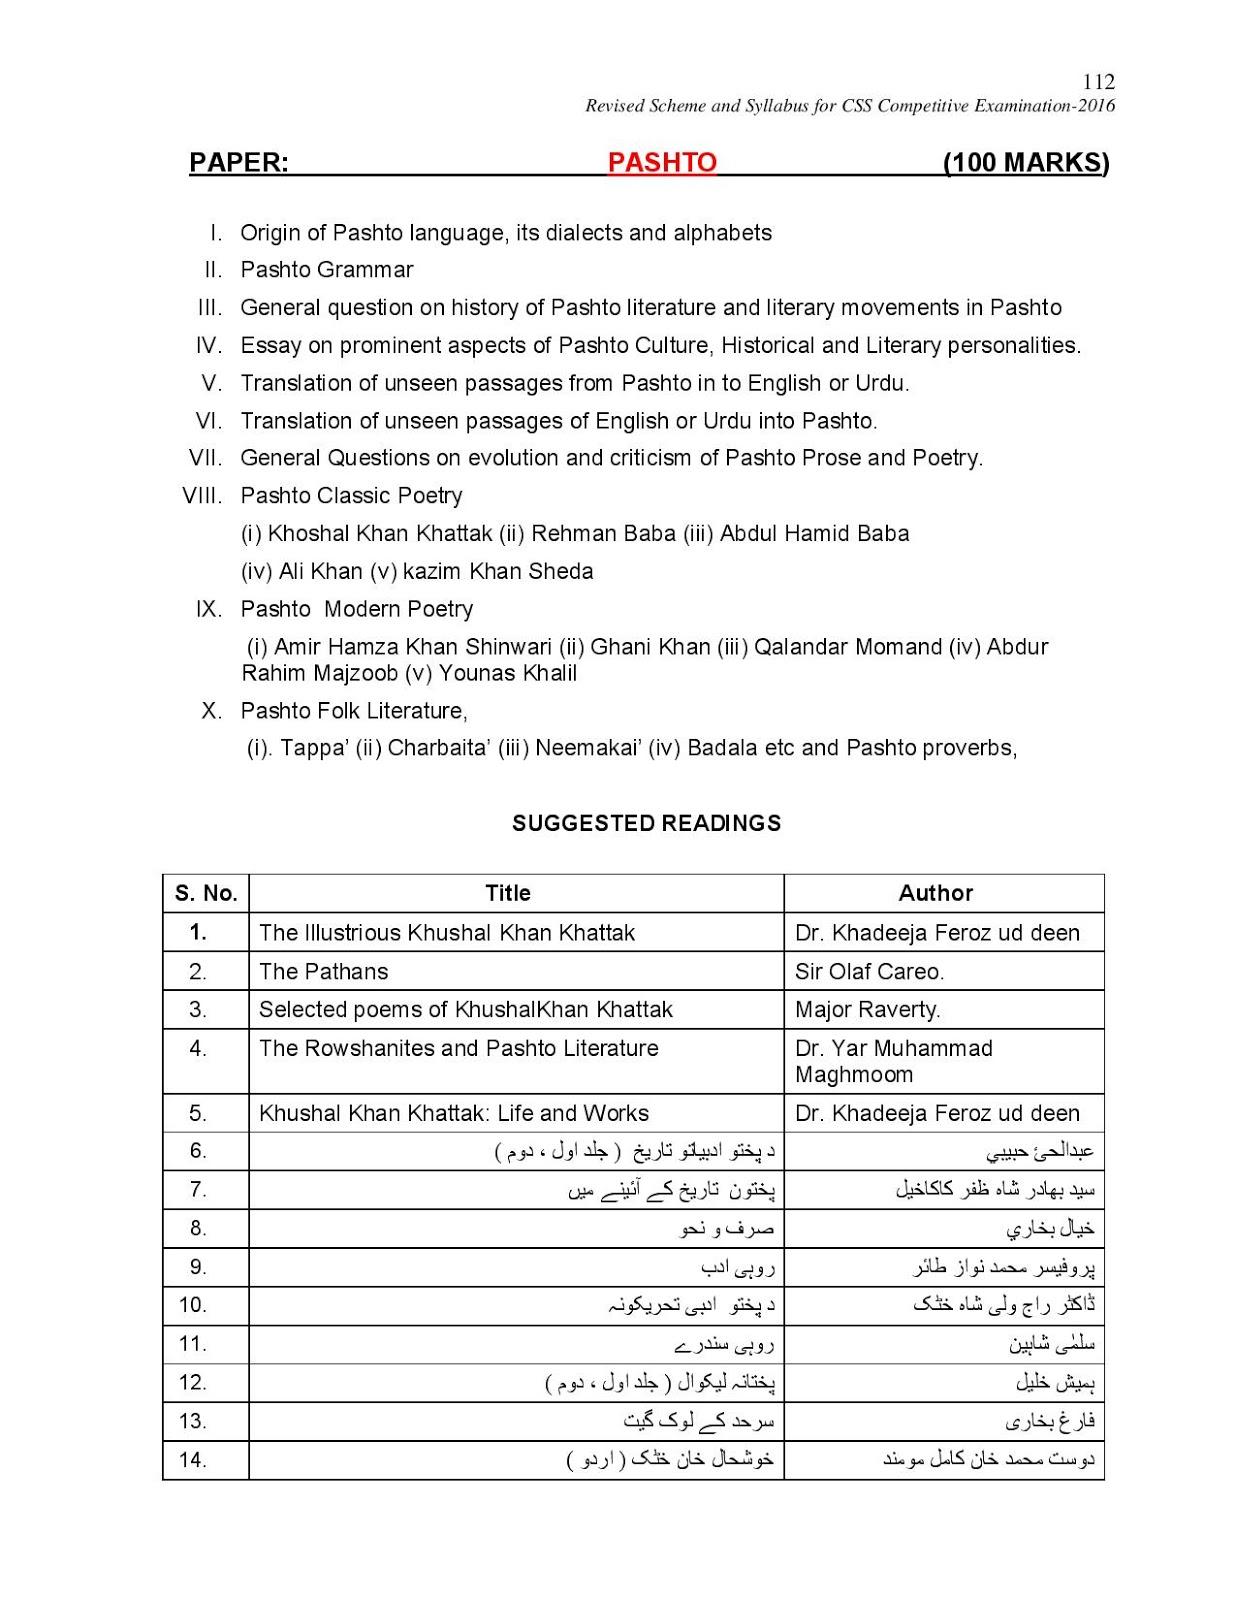 CSS 2016 New Revised Syllabus Pashto   Download PPSC FPSC